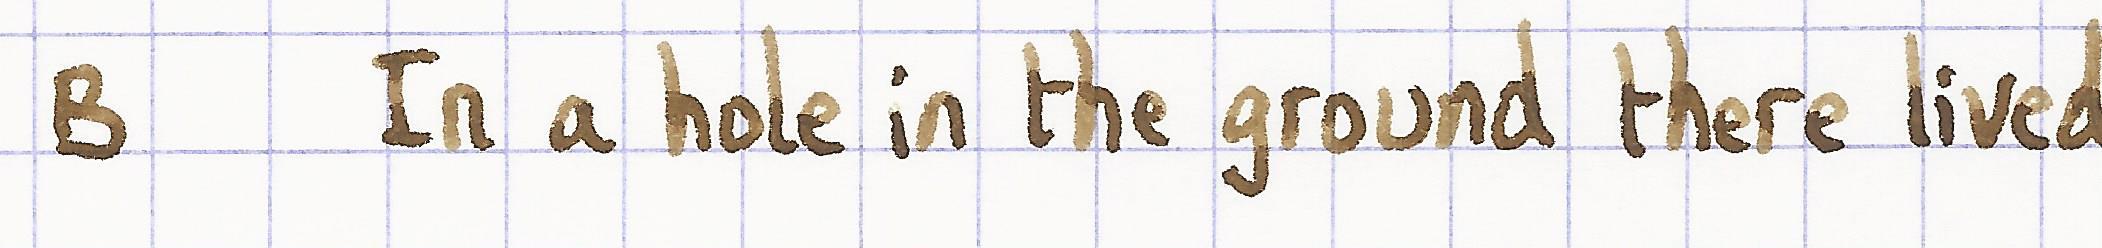 fpn_1540835753__jherbin_-_lie_de_the_-_d